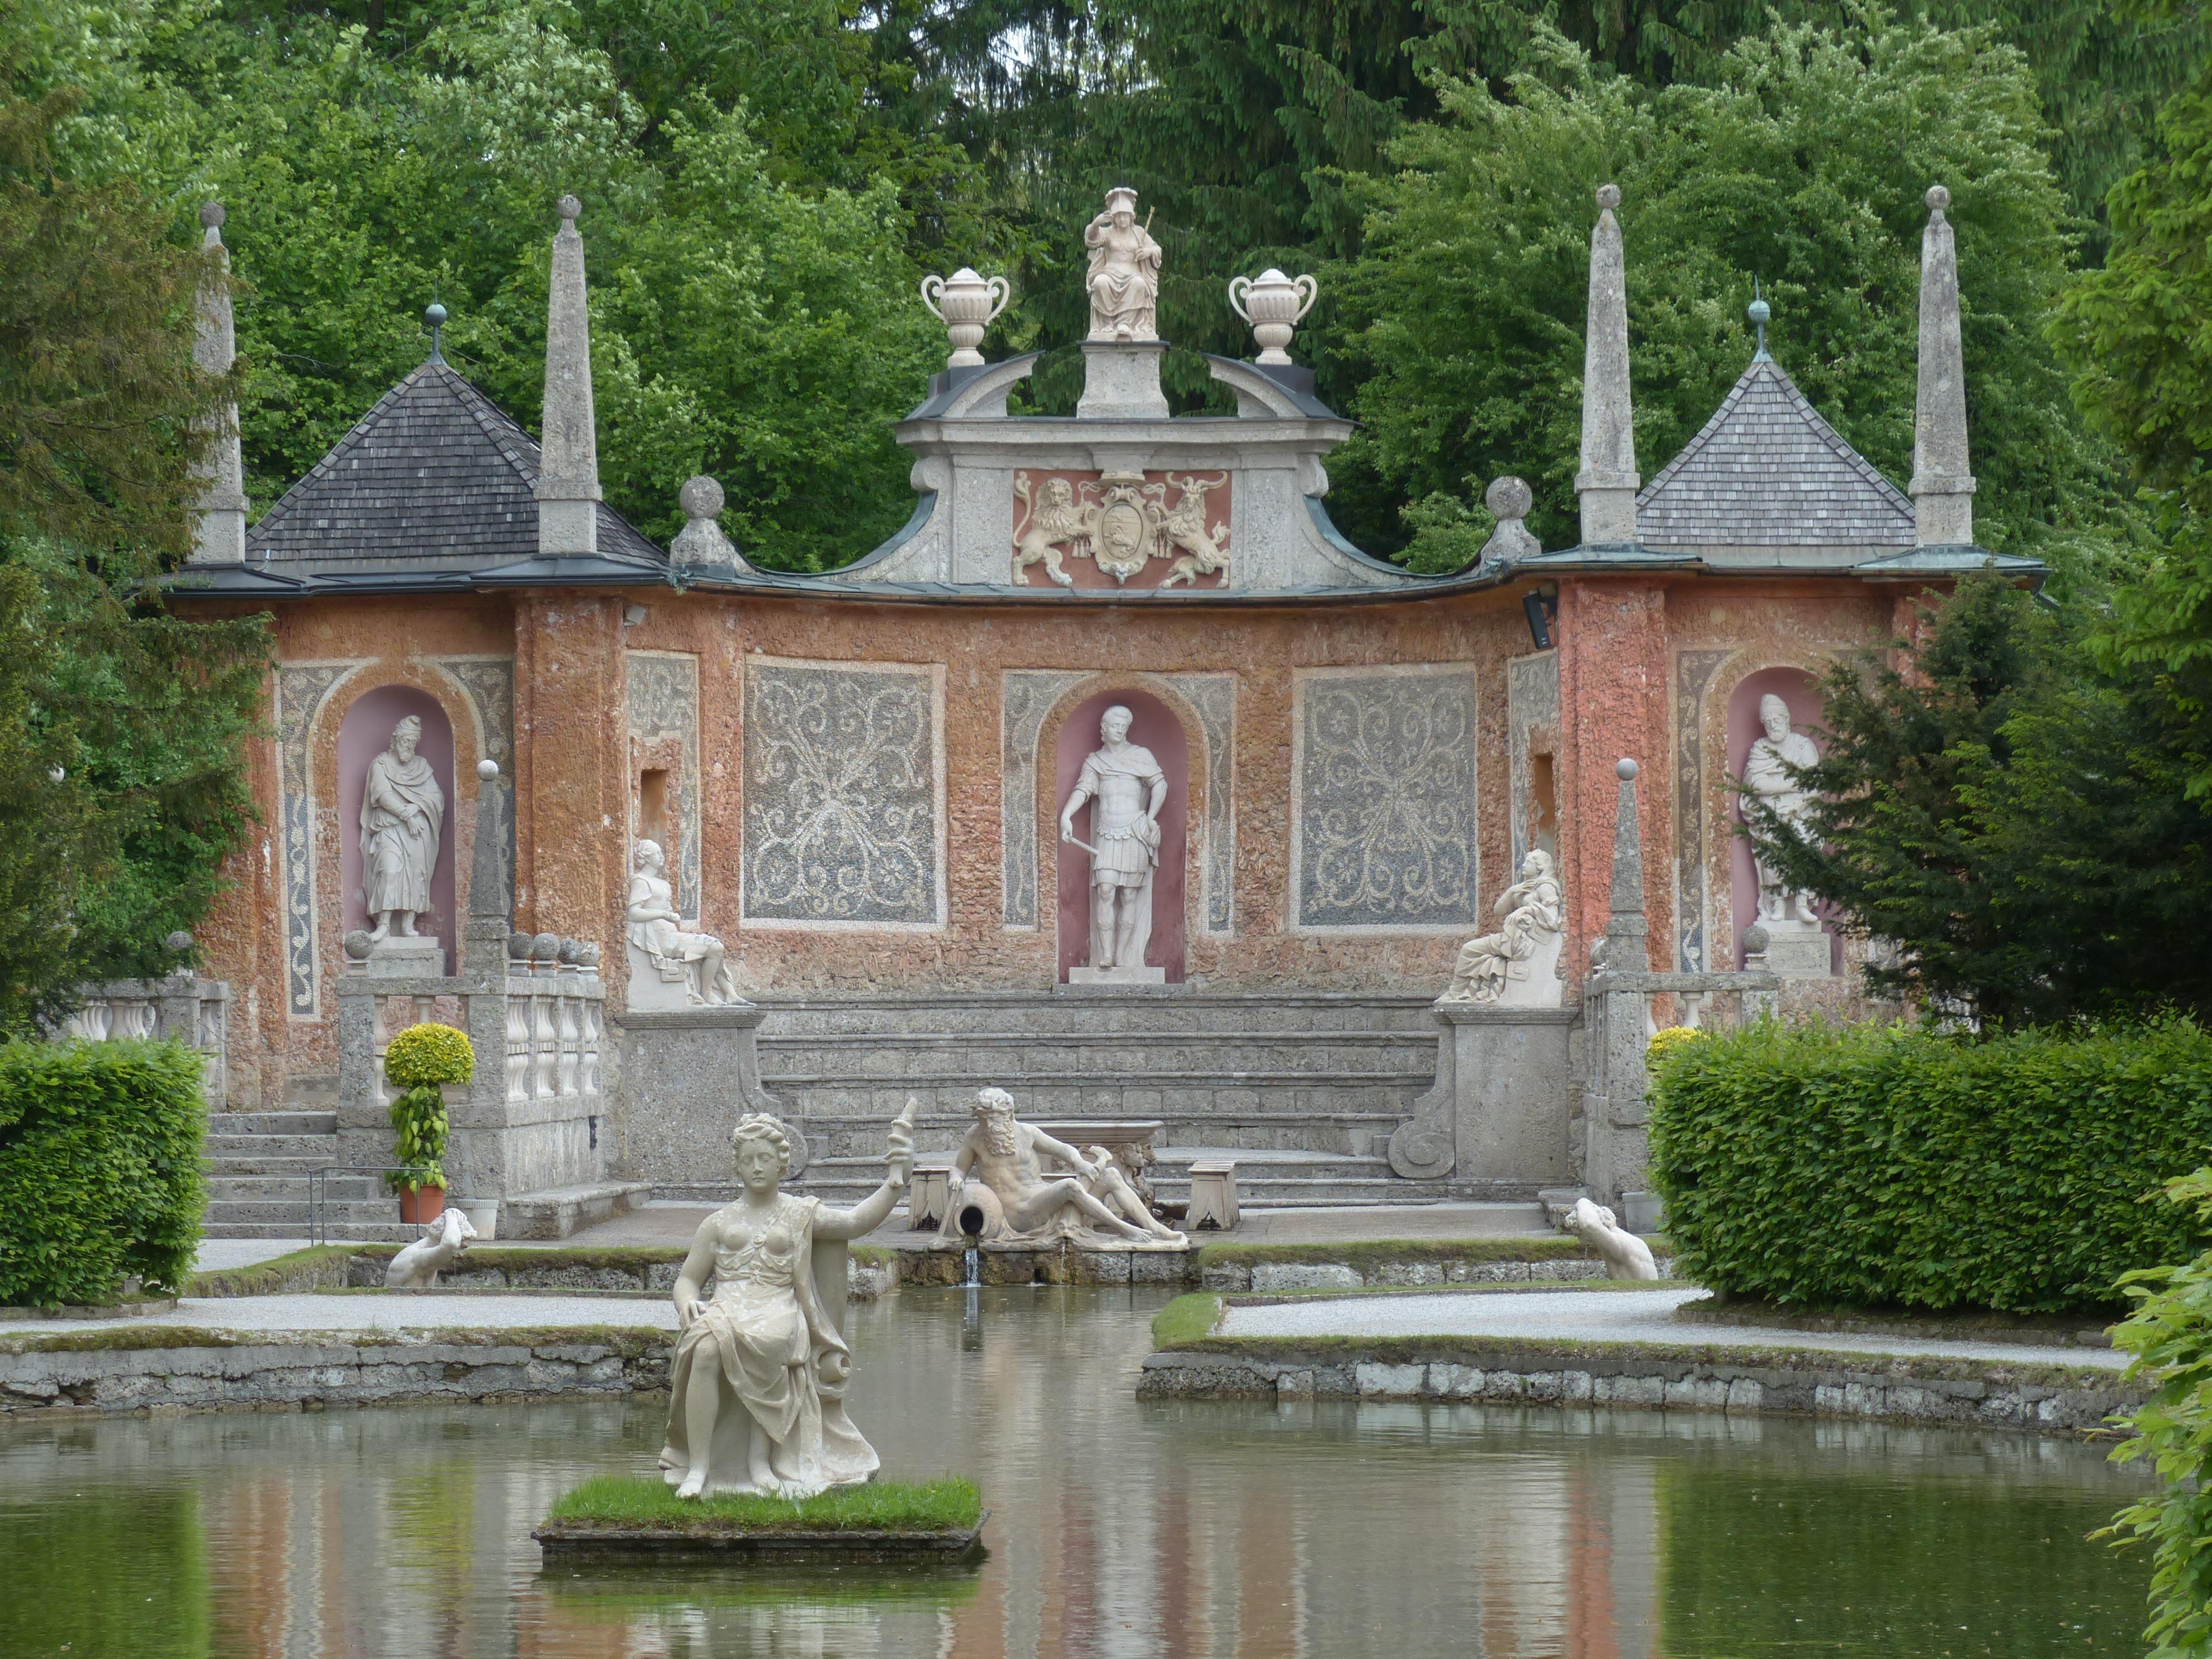 temple monastery shrine theater renaissance estate water feature salzburg water dispenser stone figures landscaped garden roman theatre - Water Garden Theater